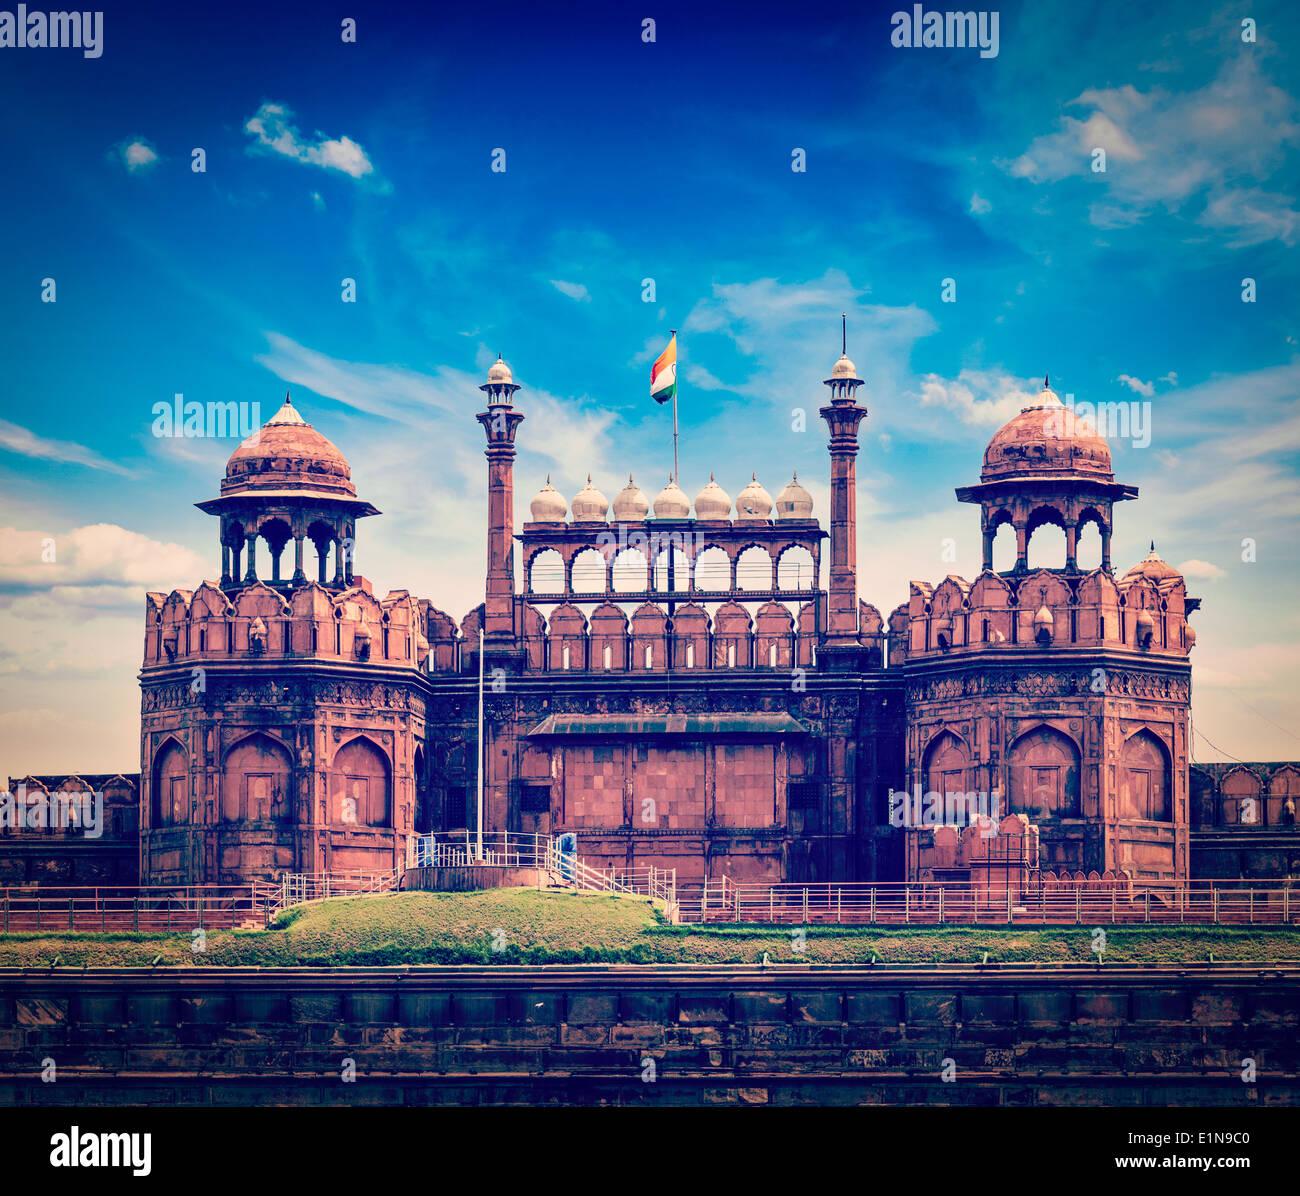 Vintage Retro estilo HIPSTER Viajes Viajes turismo imagen de la India de fondo - El Fuerte Rojo (Lal Qila) Delhi - Patrimonio de la Humanidad. Imagen De Stock